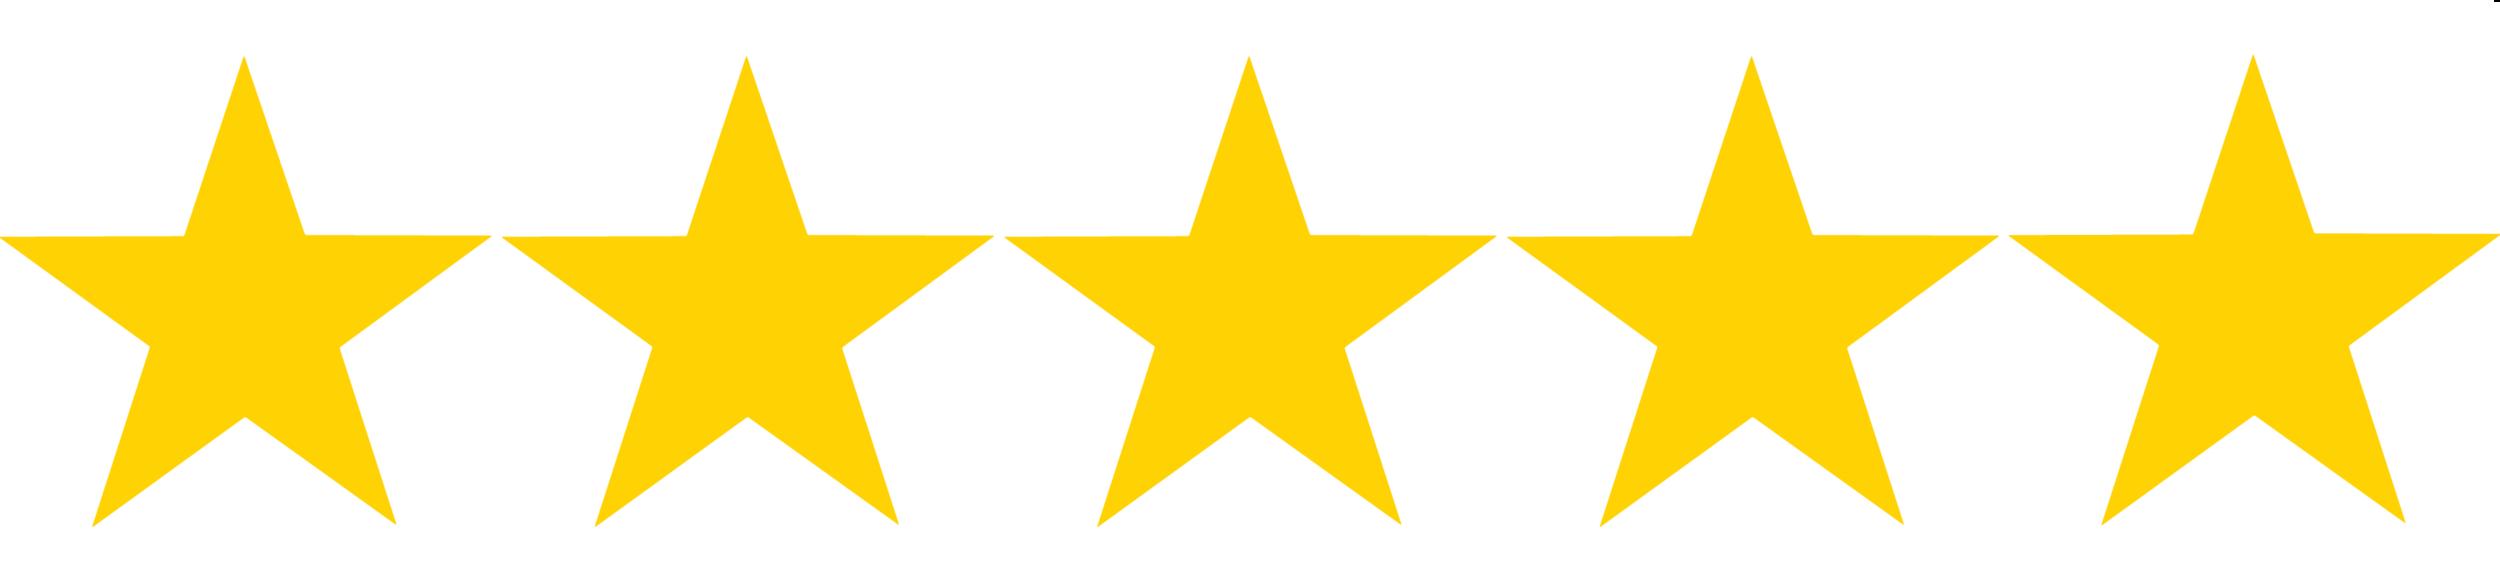 Five golden star rating